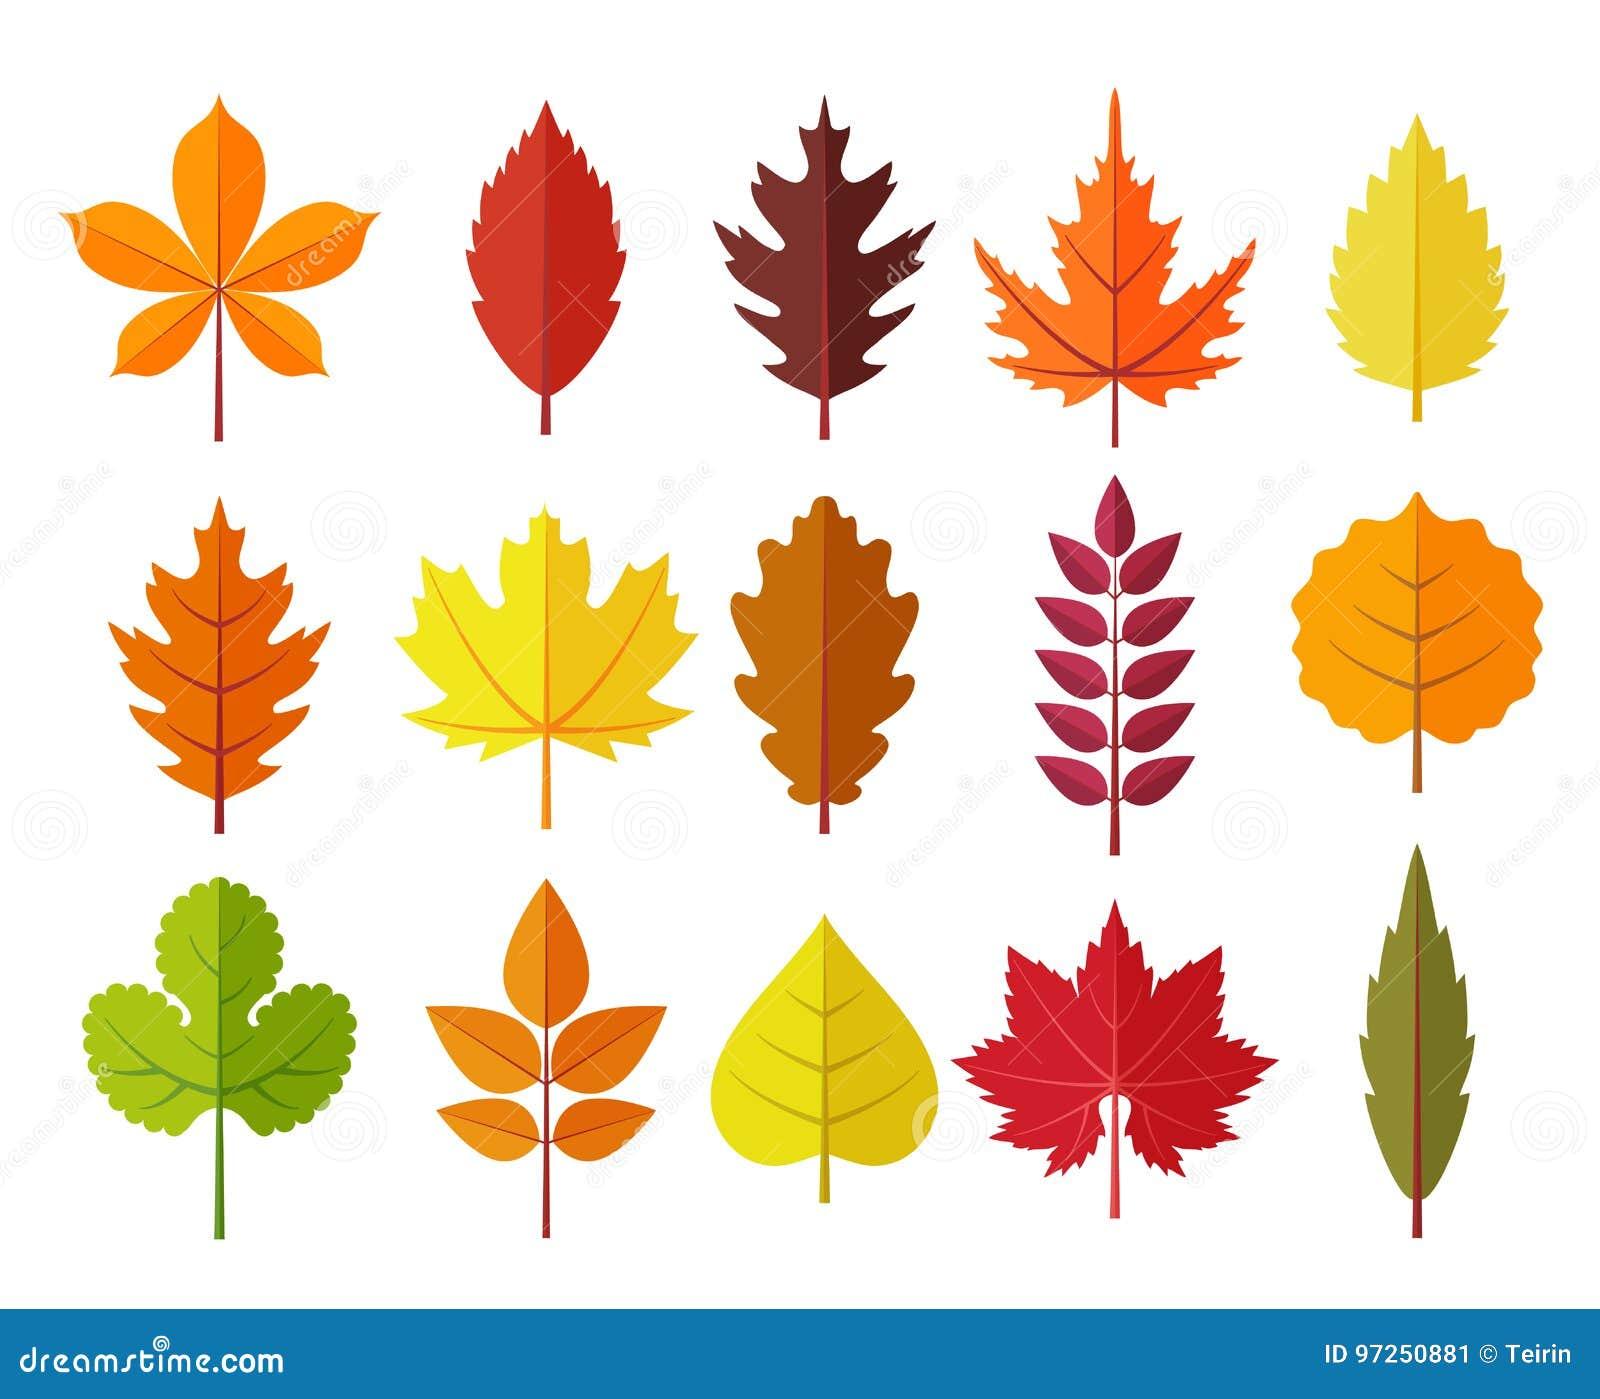 Autumn Leaves Set Isolated On White Background Simple Cartoon Flat Style Vector Illustration Stock Vector Illustration Of Botany Fall 97250881